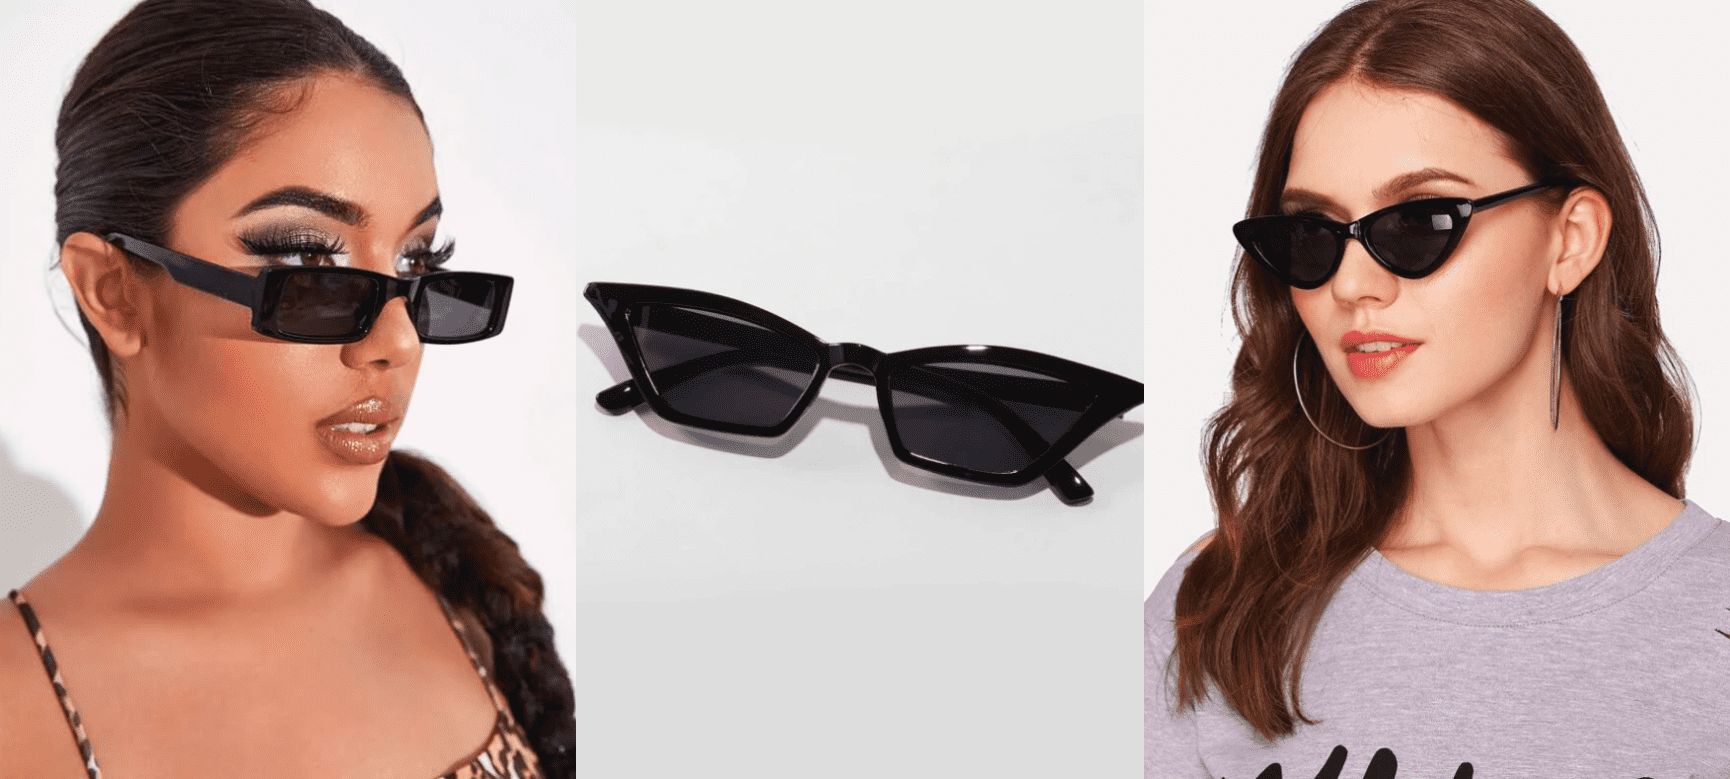 очки shein бестселлеры